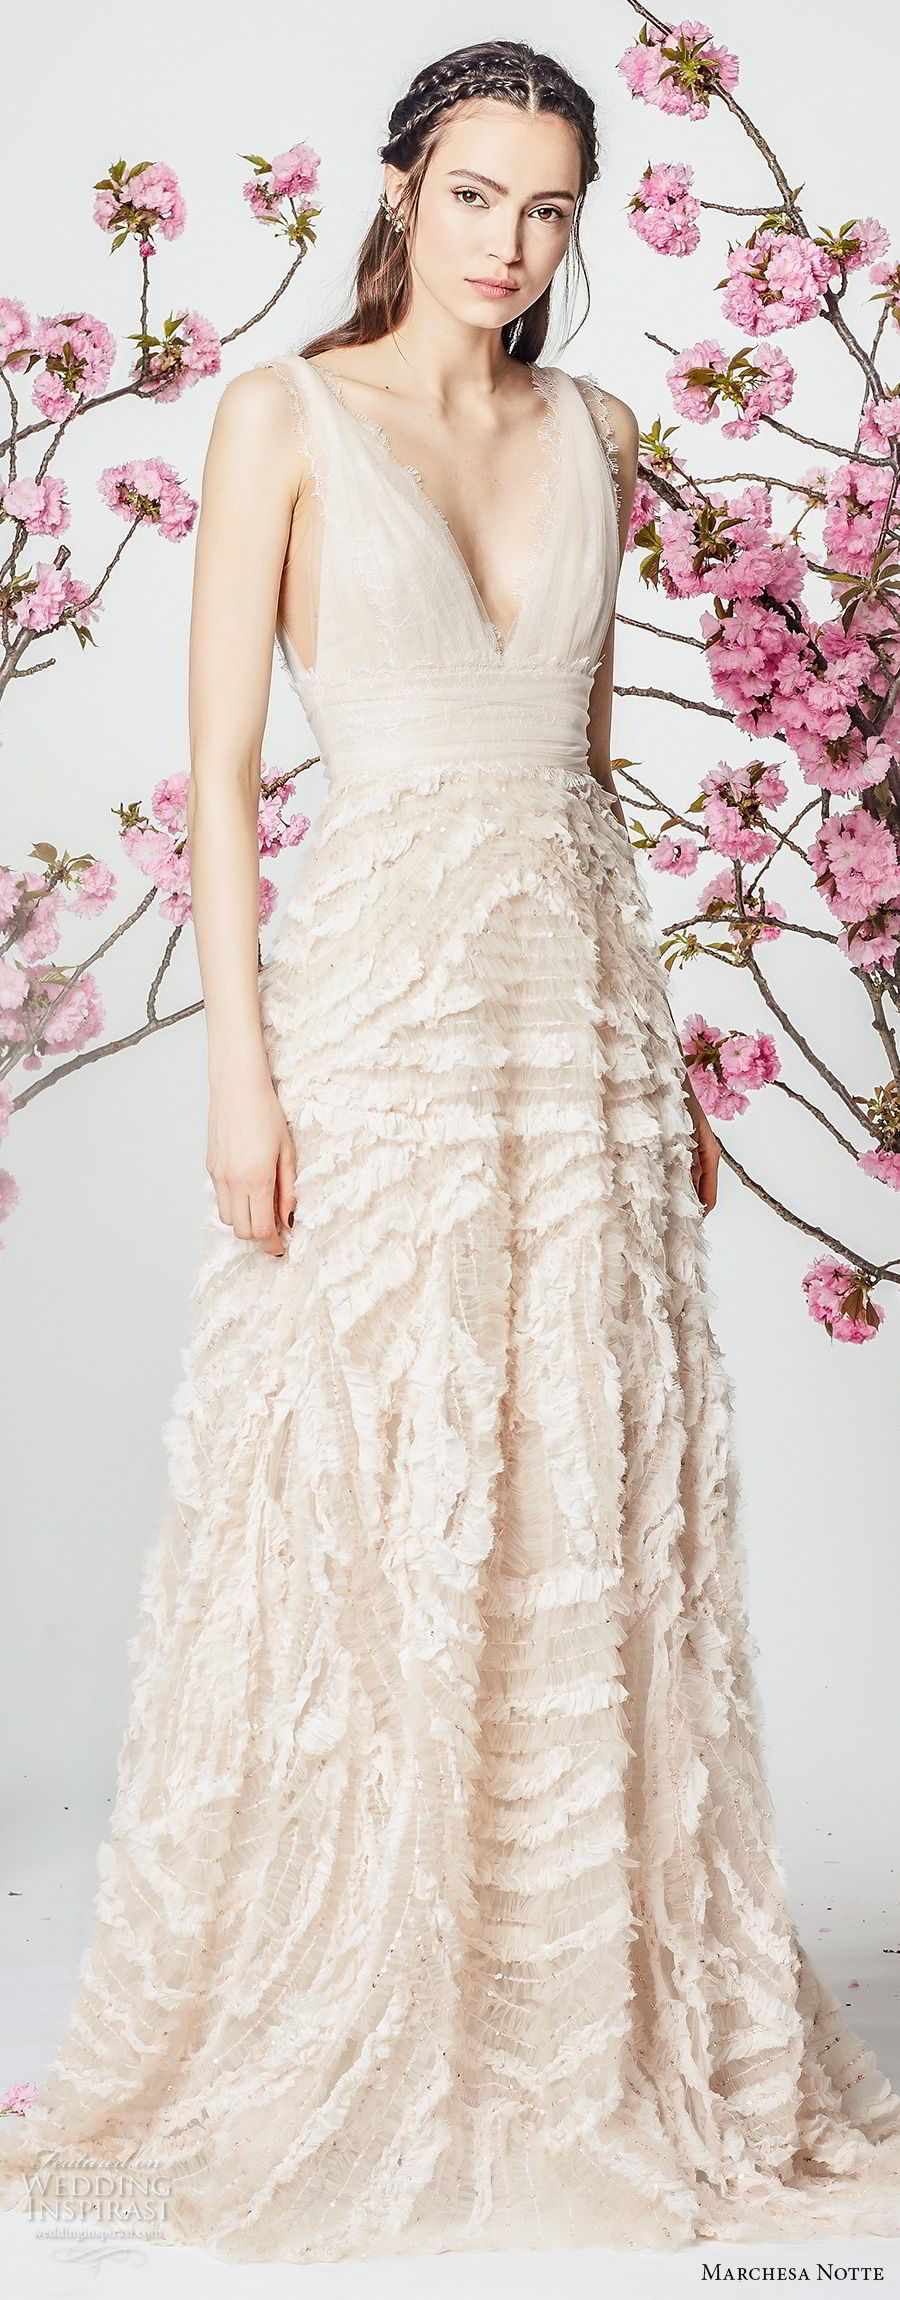 Marchesa notte spring wedding dresses blush color marchesa